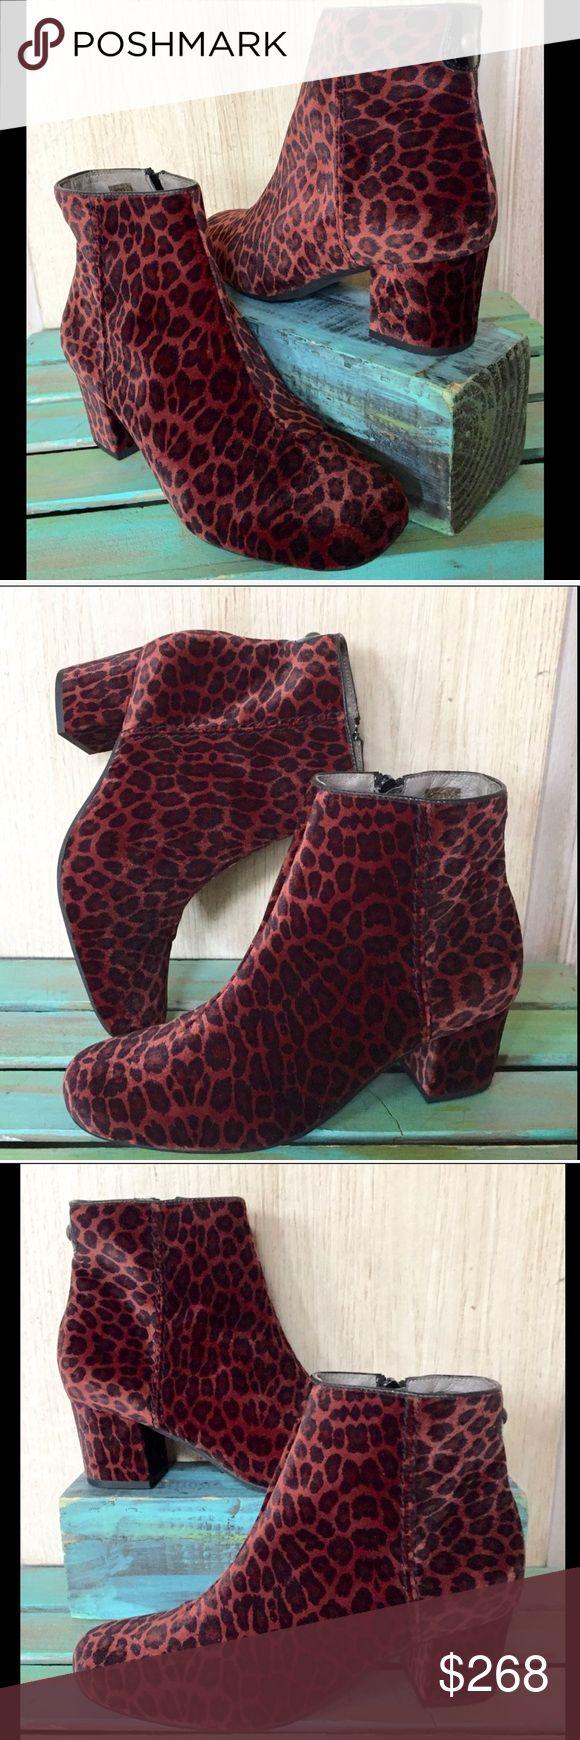 "Anthropologie Hudson Garnett Velvet Leopard 39 Anthropologie Hudson Garnett Velvet Leopard Ankle Boots  super soft rusty wine, black & brown leopard print velvet inside zipper * center seam & almond shaped toe New Without Box  *  Size:  39 retail price:  $298.00  * runs true to size   2.25"" heel * 5"" shaft Anthropologie Shoes Ankle Boots & Booties"